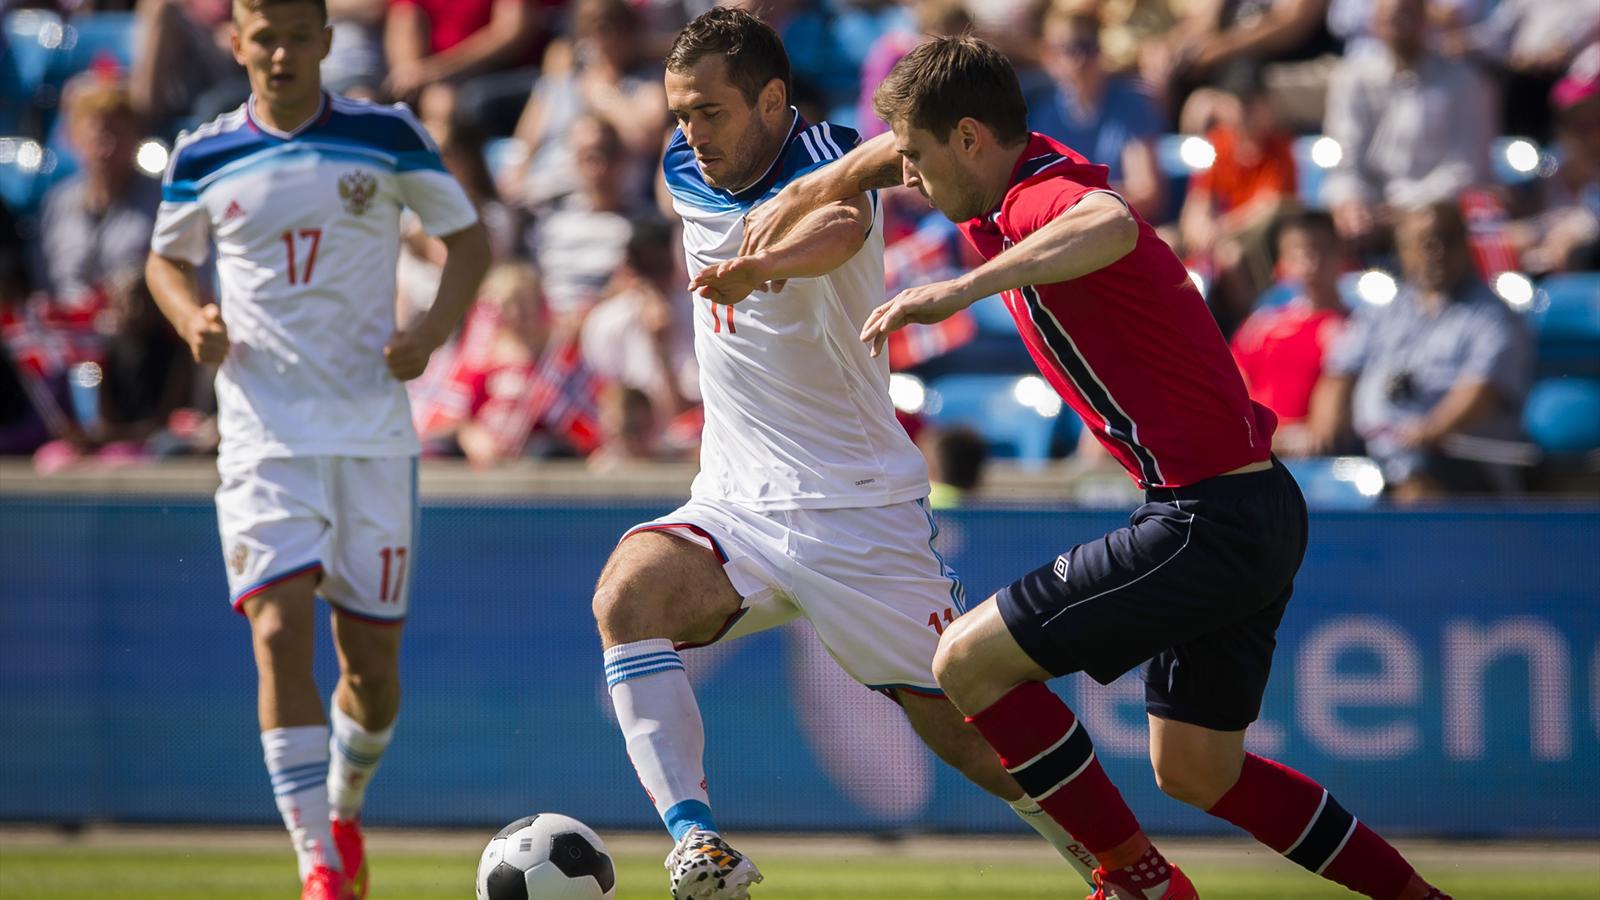 Евро 2016 фабио капелло включил артема